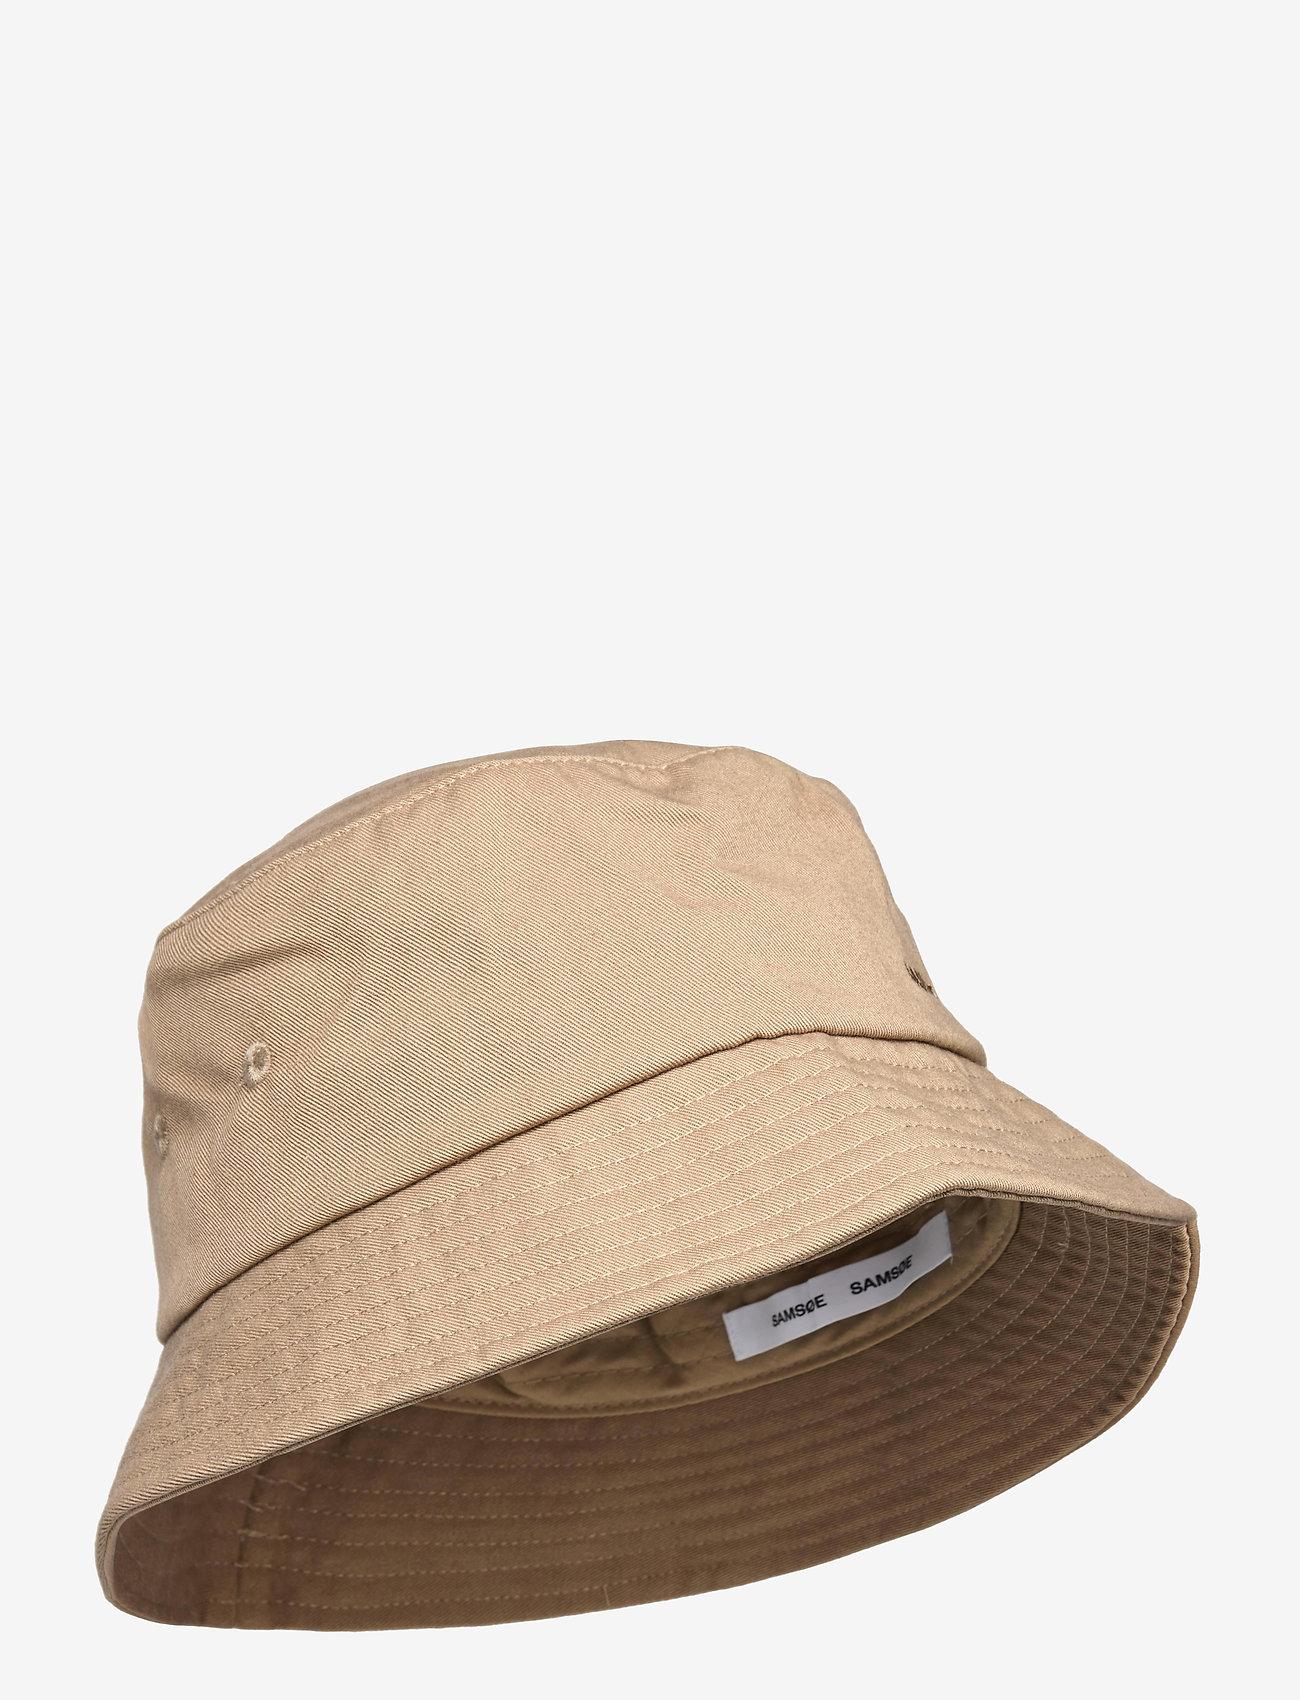 Samsøe Samsøe - Anton bucket hat 14061 - bonnets & casquettes - caribou - 0